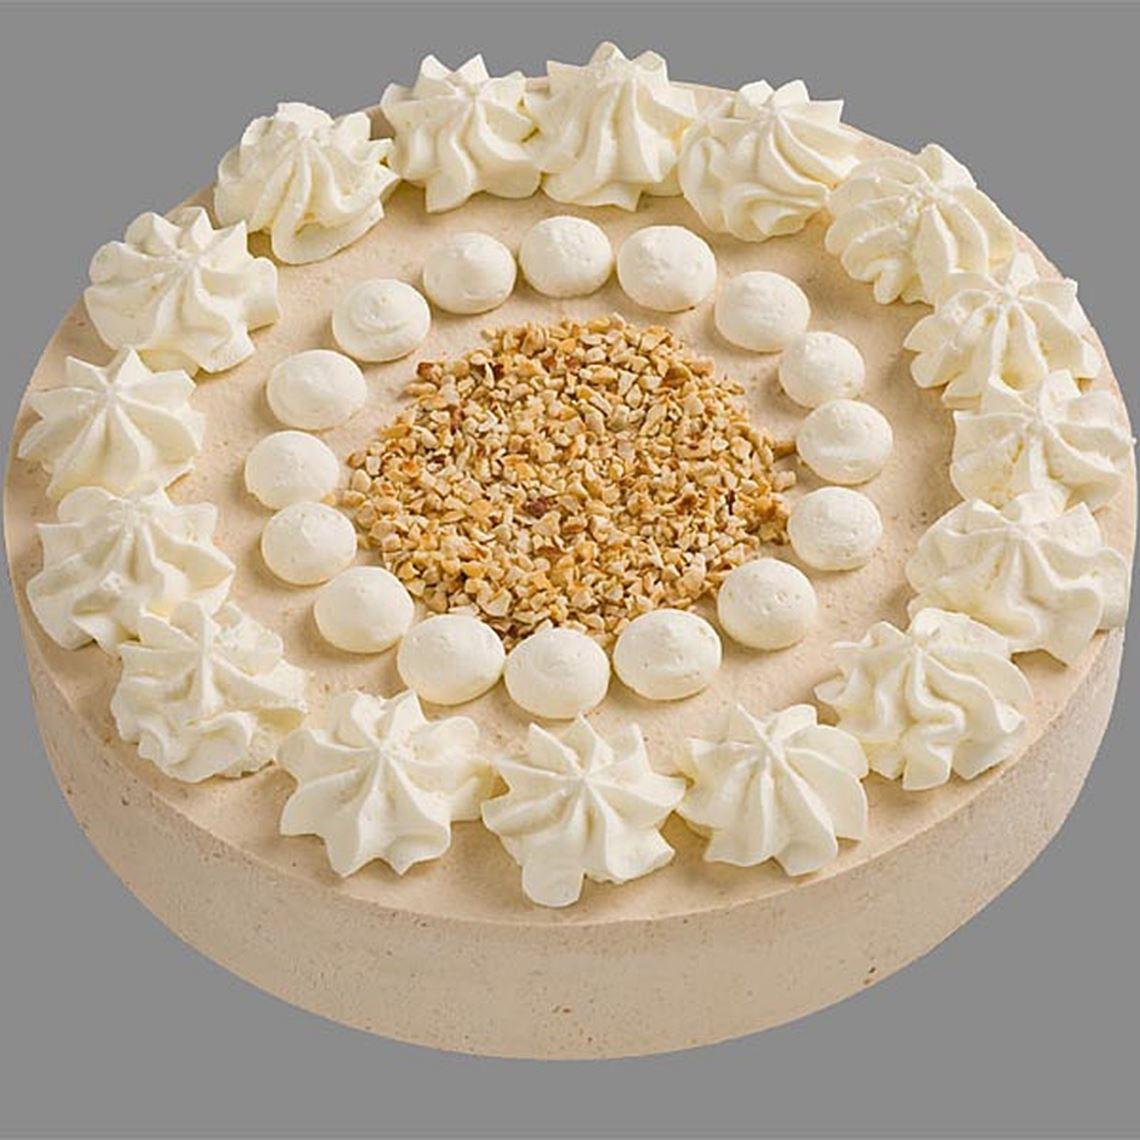 Nuss Sahne Torte Gastro TK 1600g